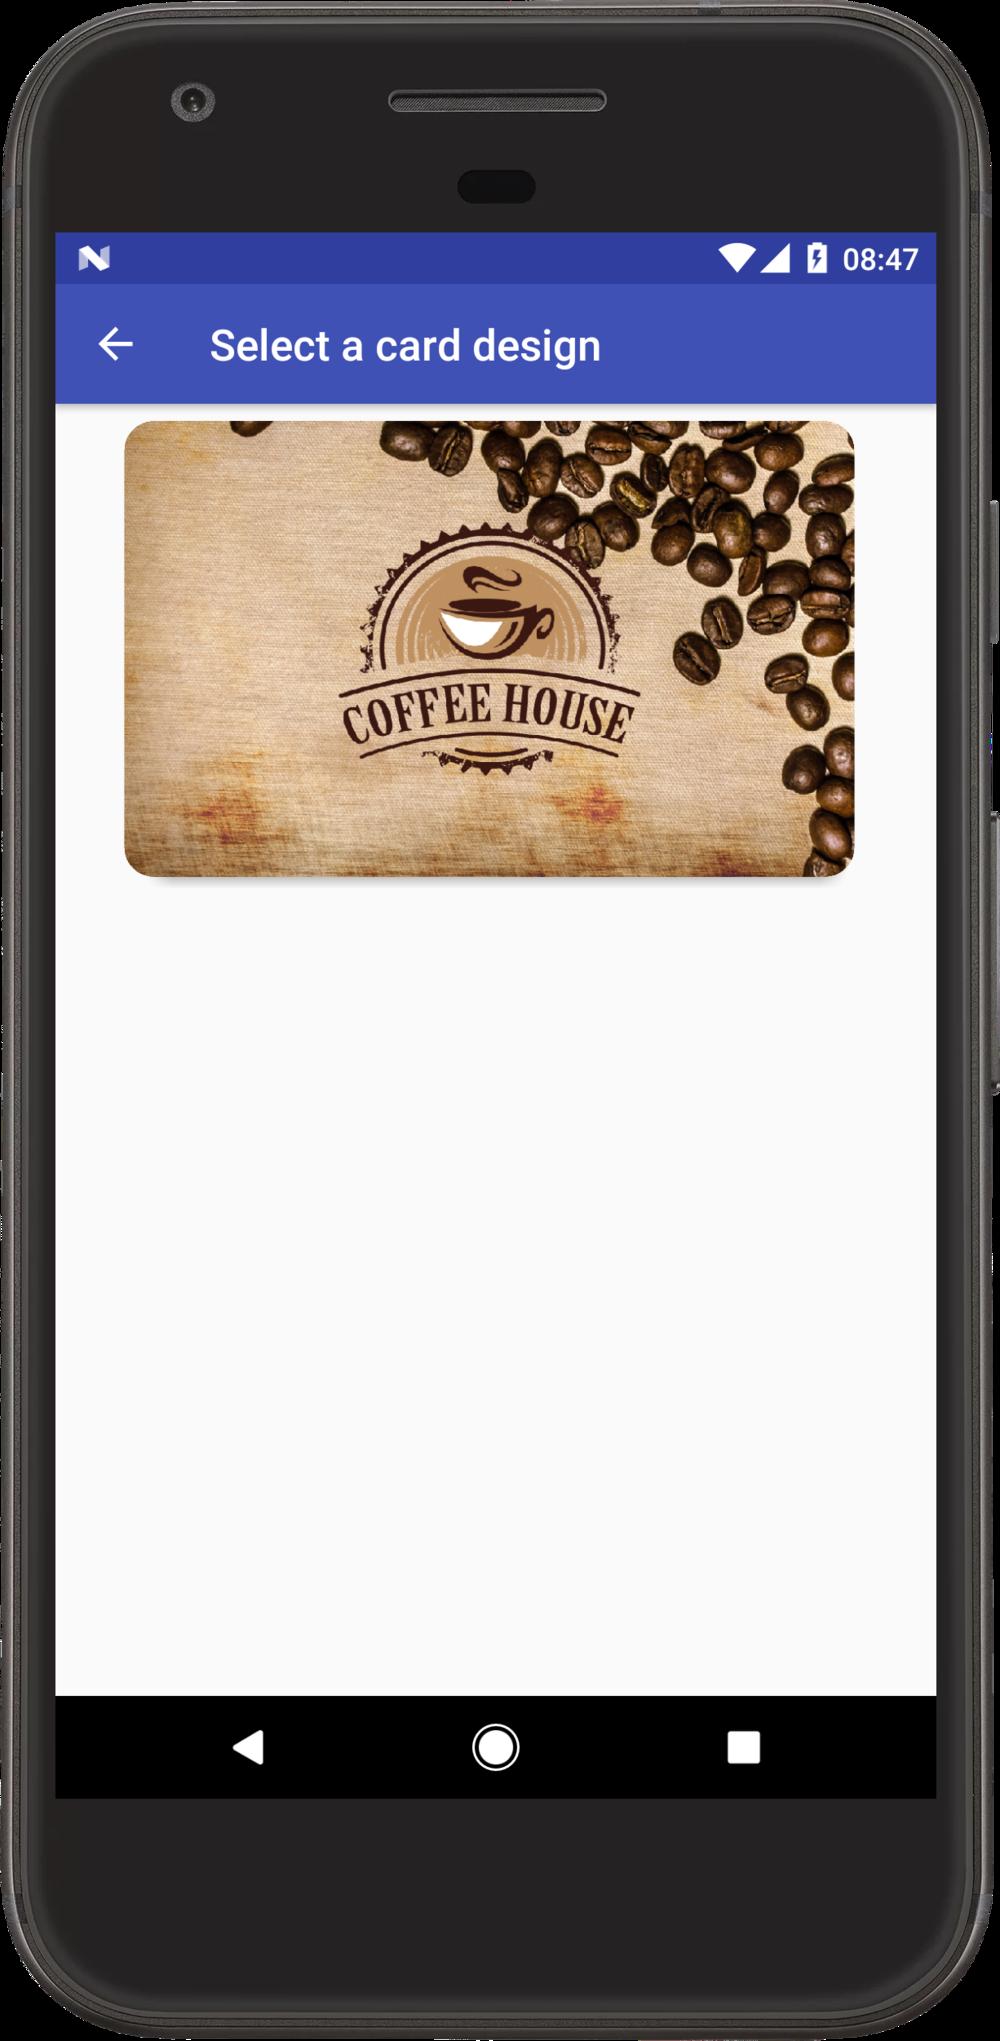 enroll-select-card-design.png